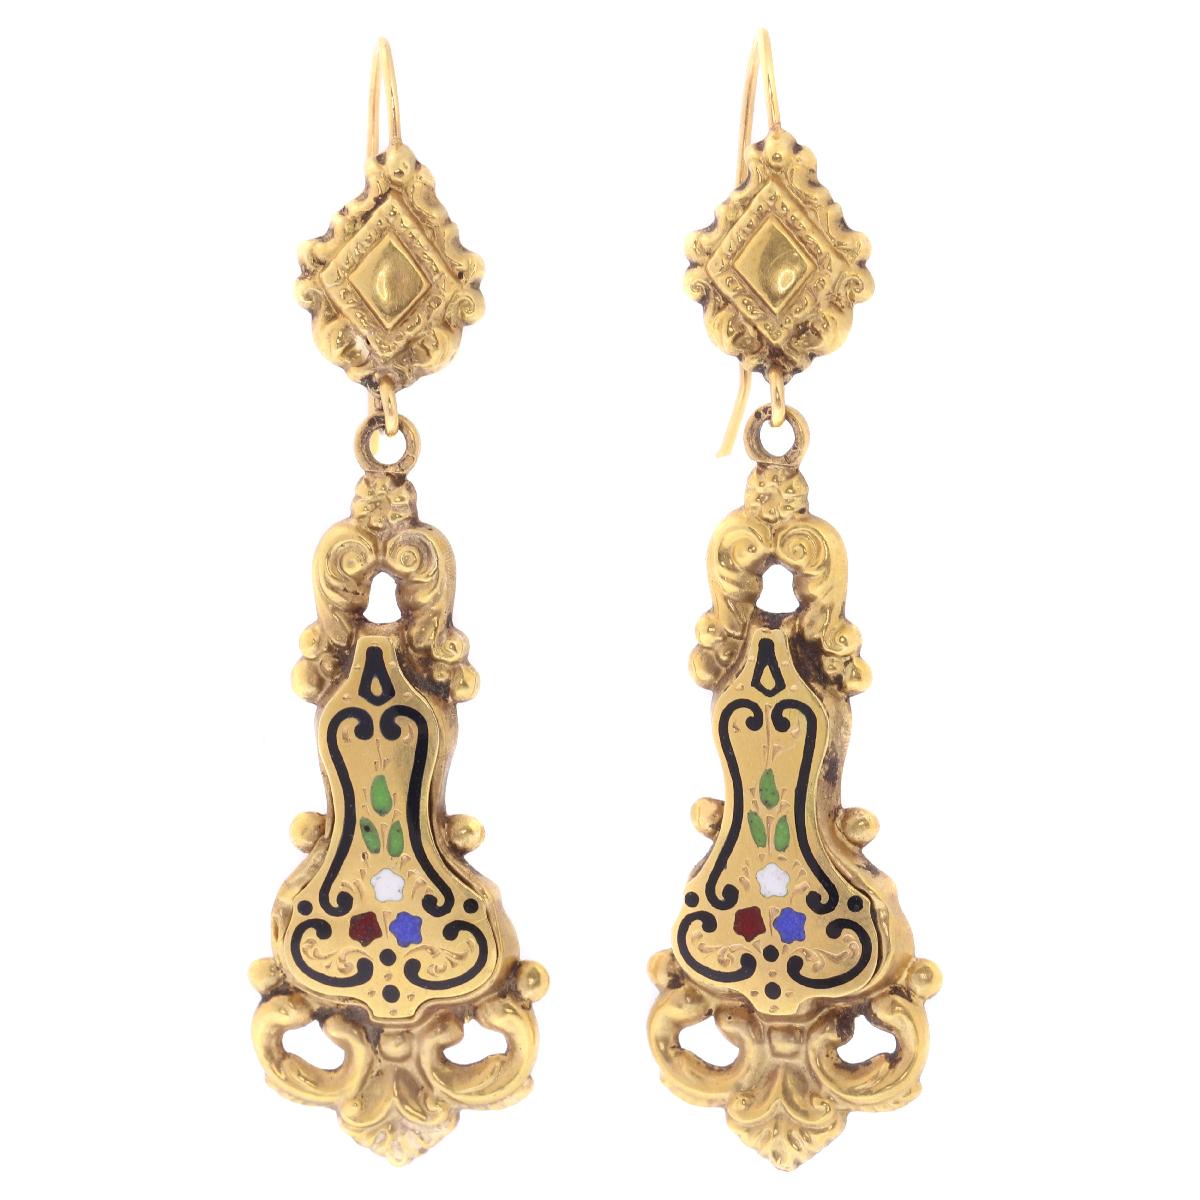 90d93ce1c Antique floral enamel dangle earrings yellow gold, Victorian era:  Description by Adin Antique Jewelry.